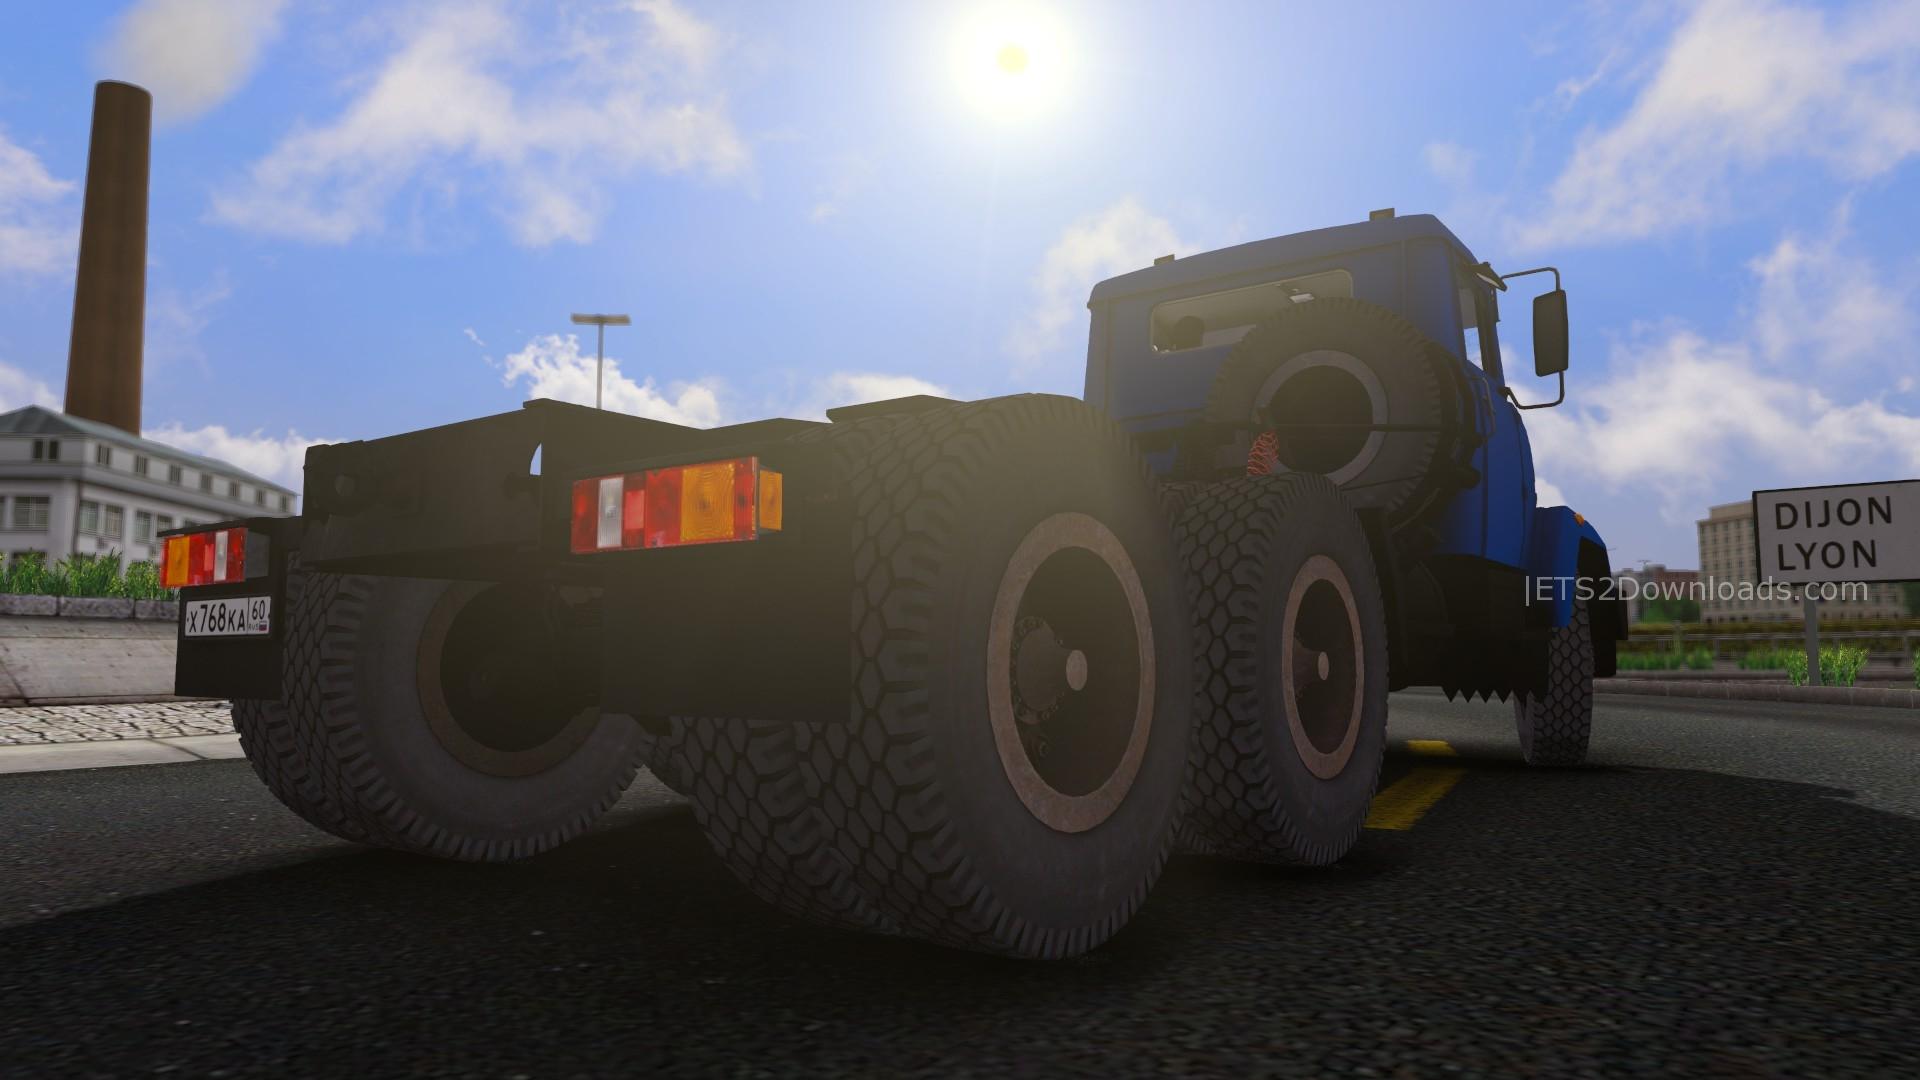 kraz-truck-by-aronson-10